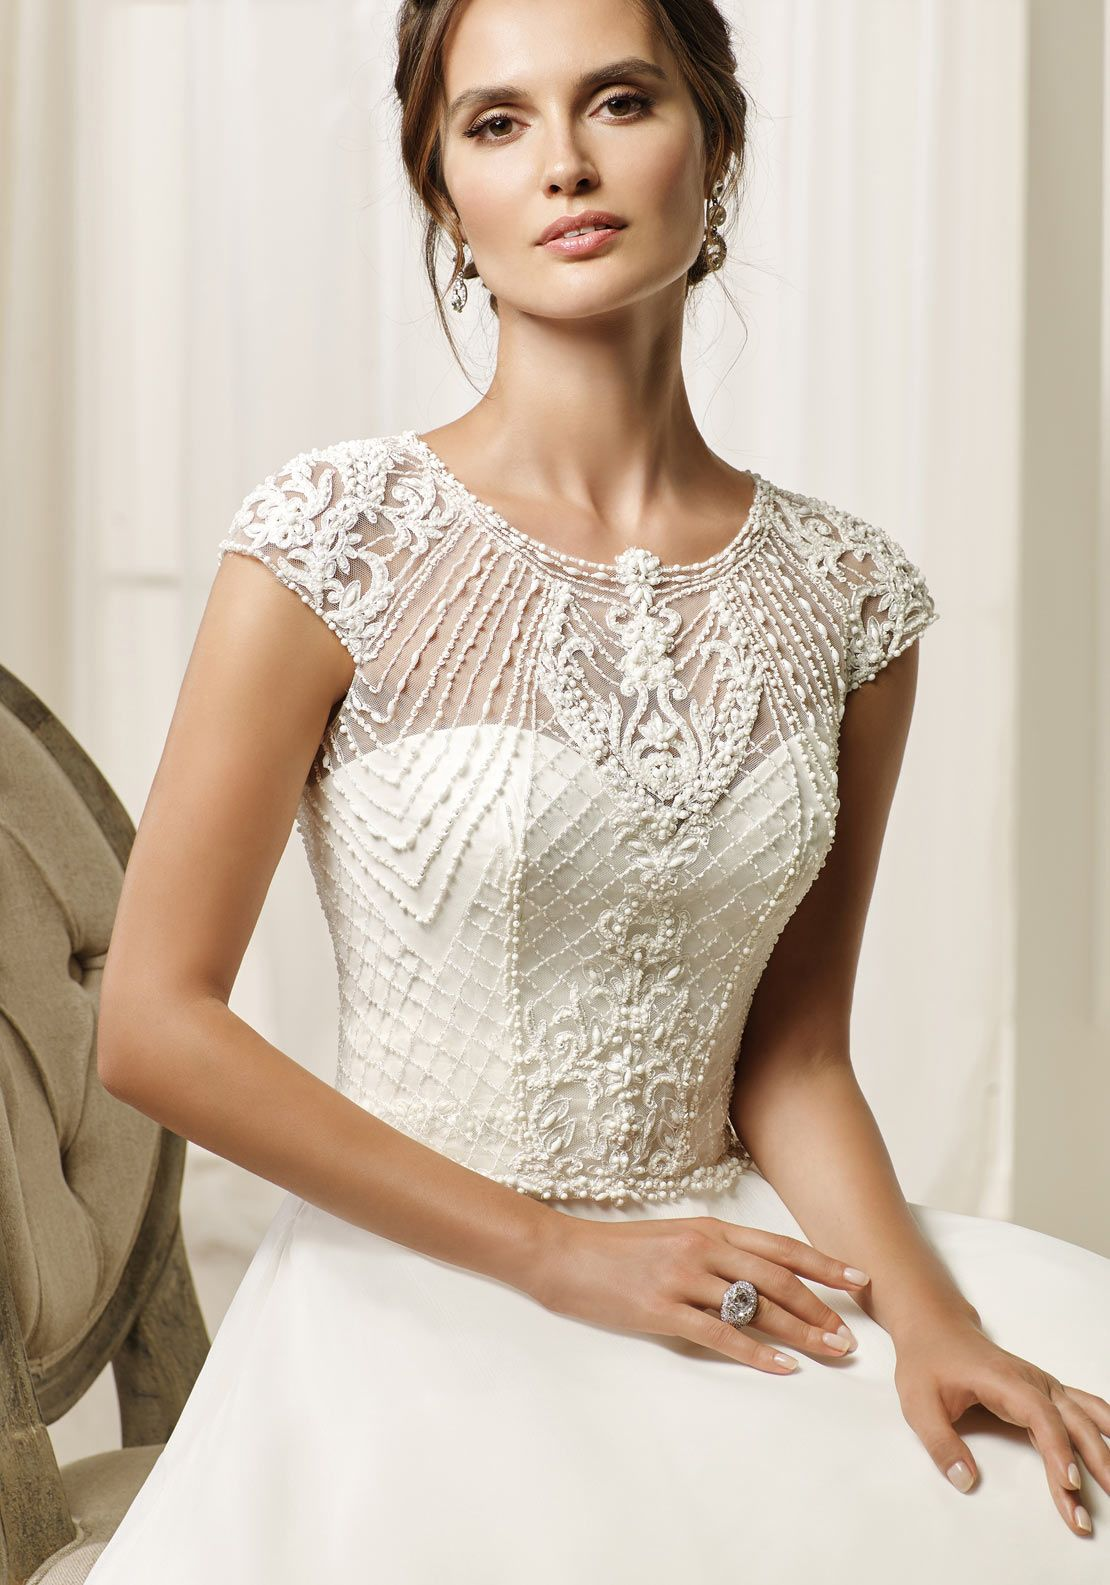 Ronald joyce wedding dress lisa anne wedding pinterest